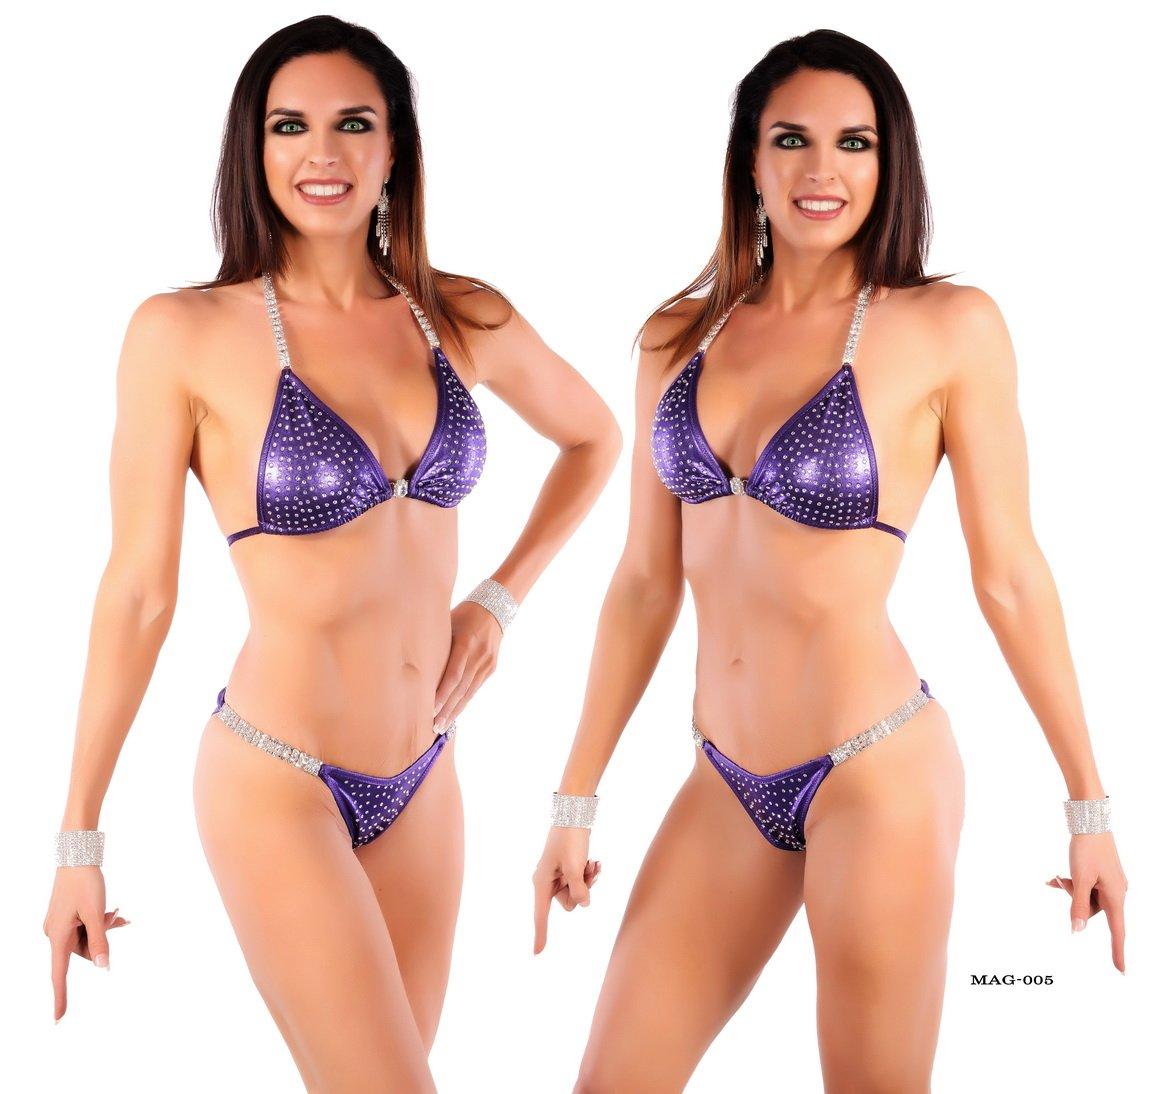 Elegantfitt Competition Bikini Suit with Imitation Swarvoski Crystals